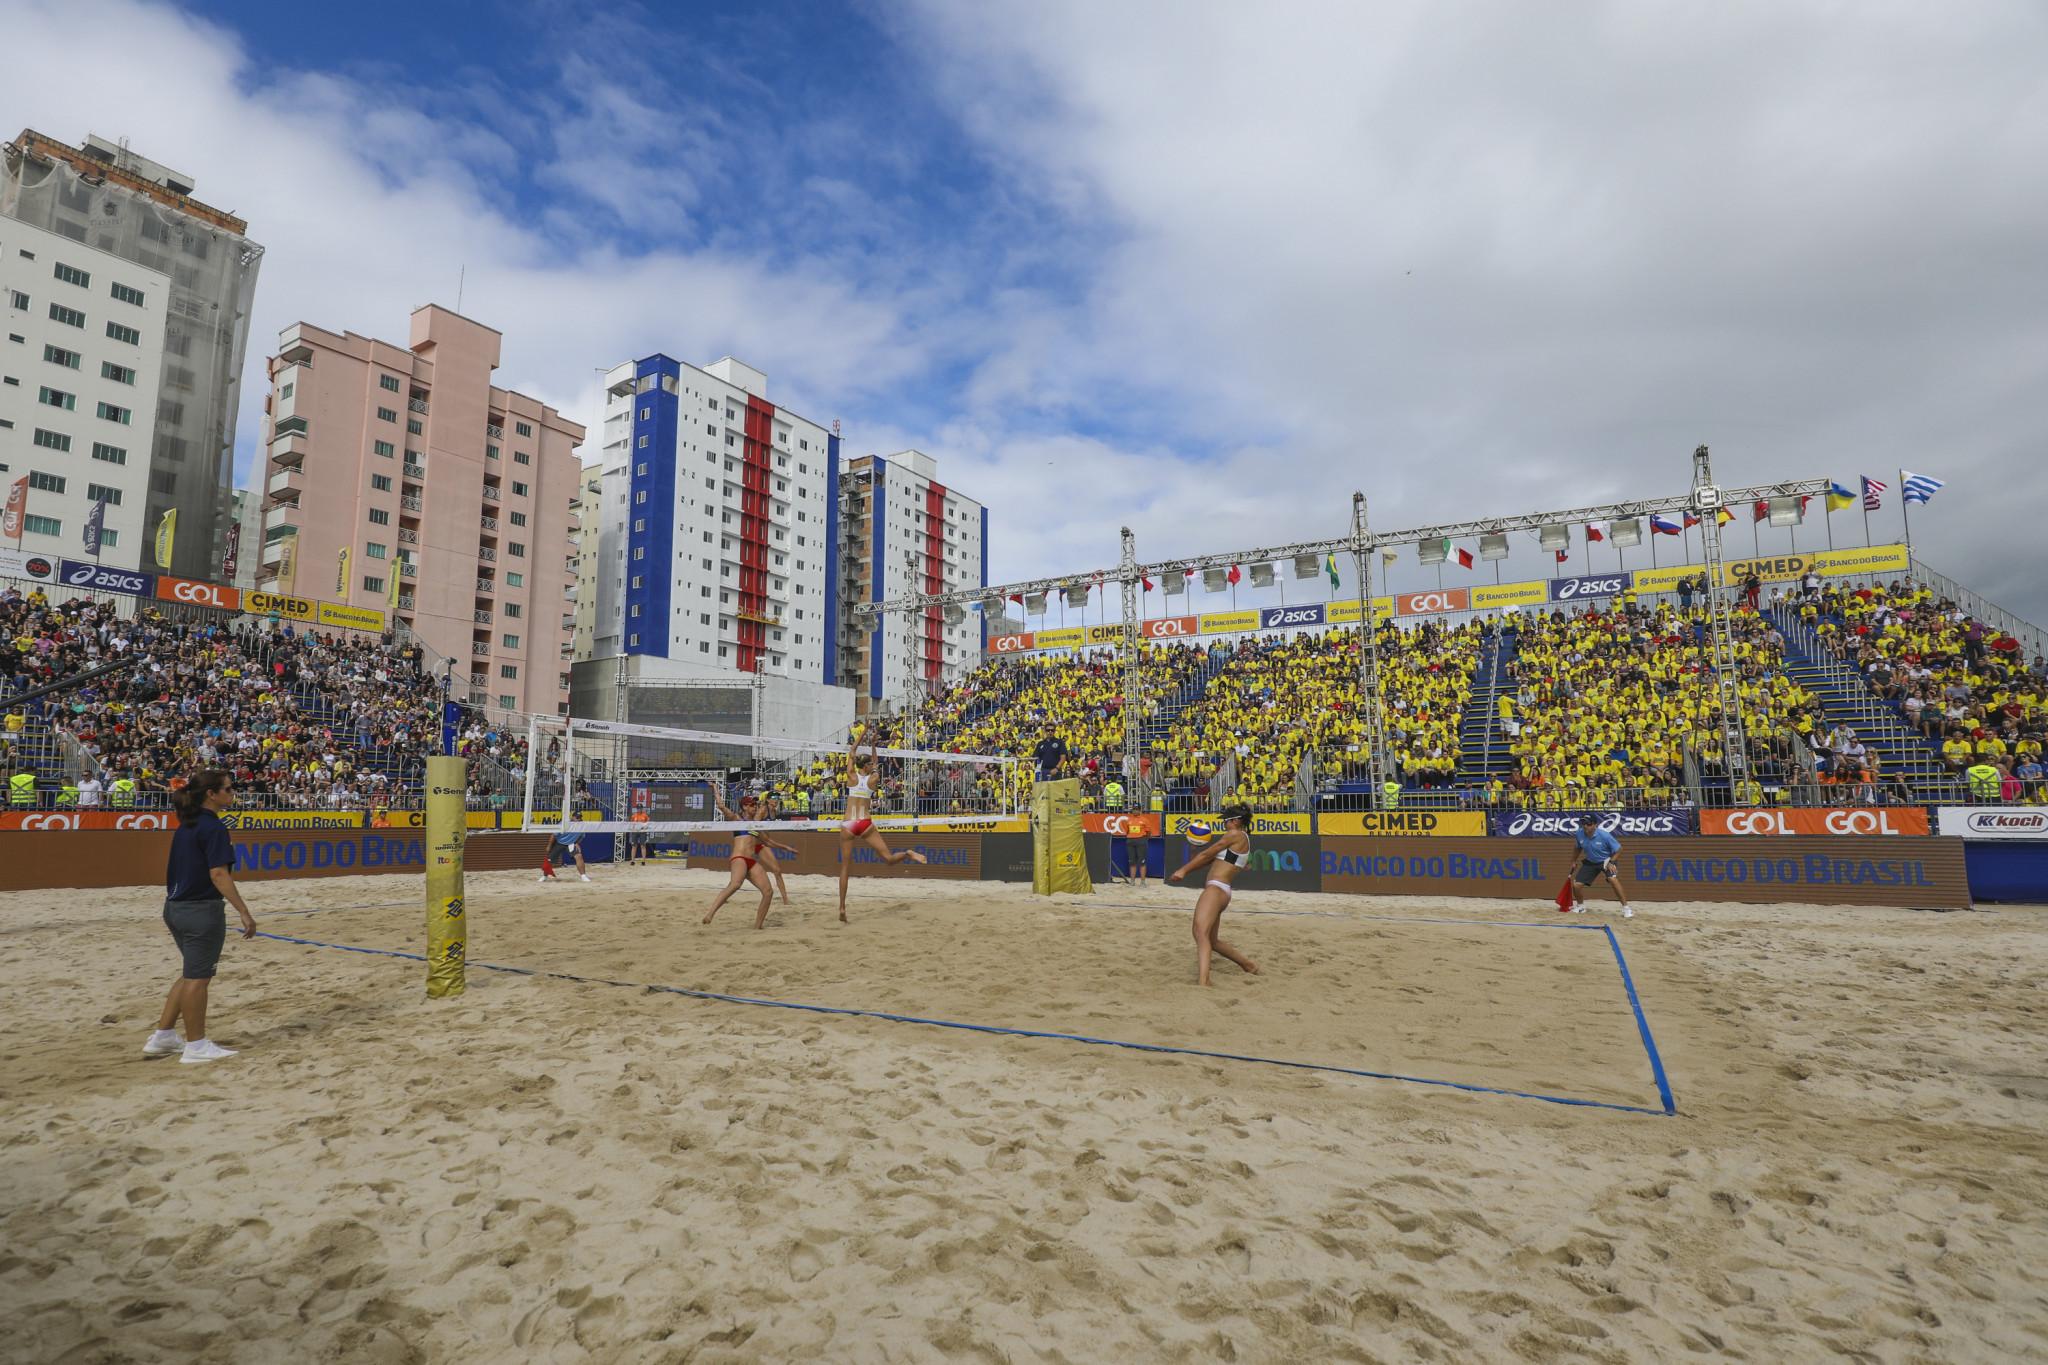 Itapema FIVB Beach Volleyball World Tour event rescheduled for November